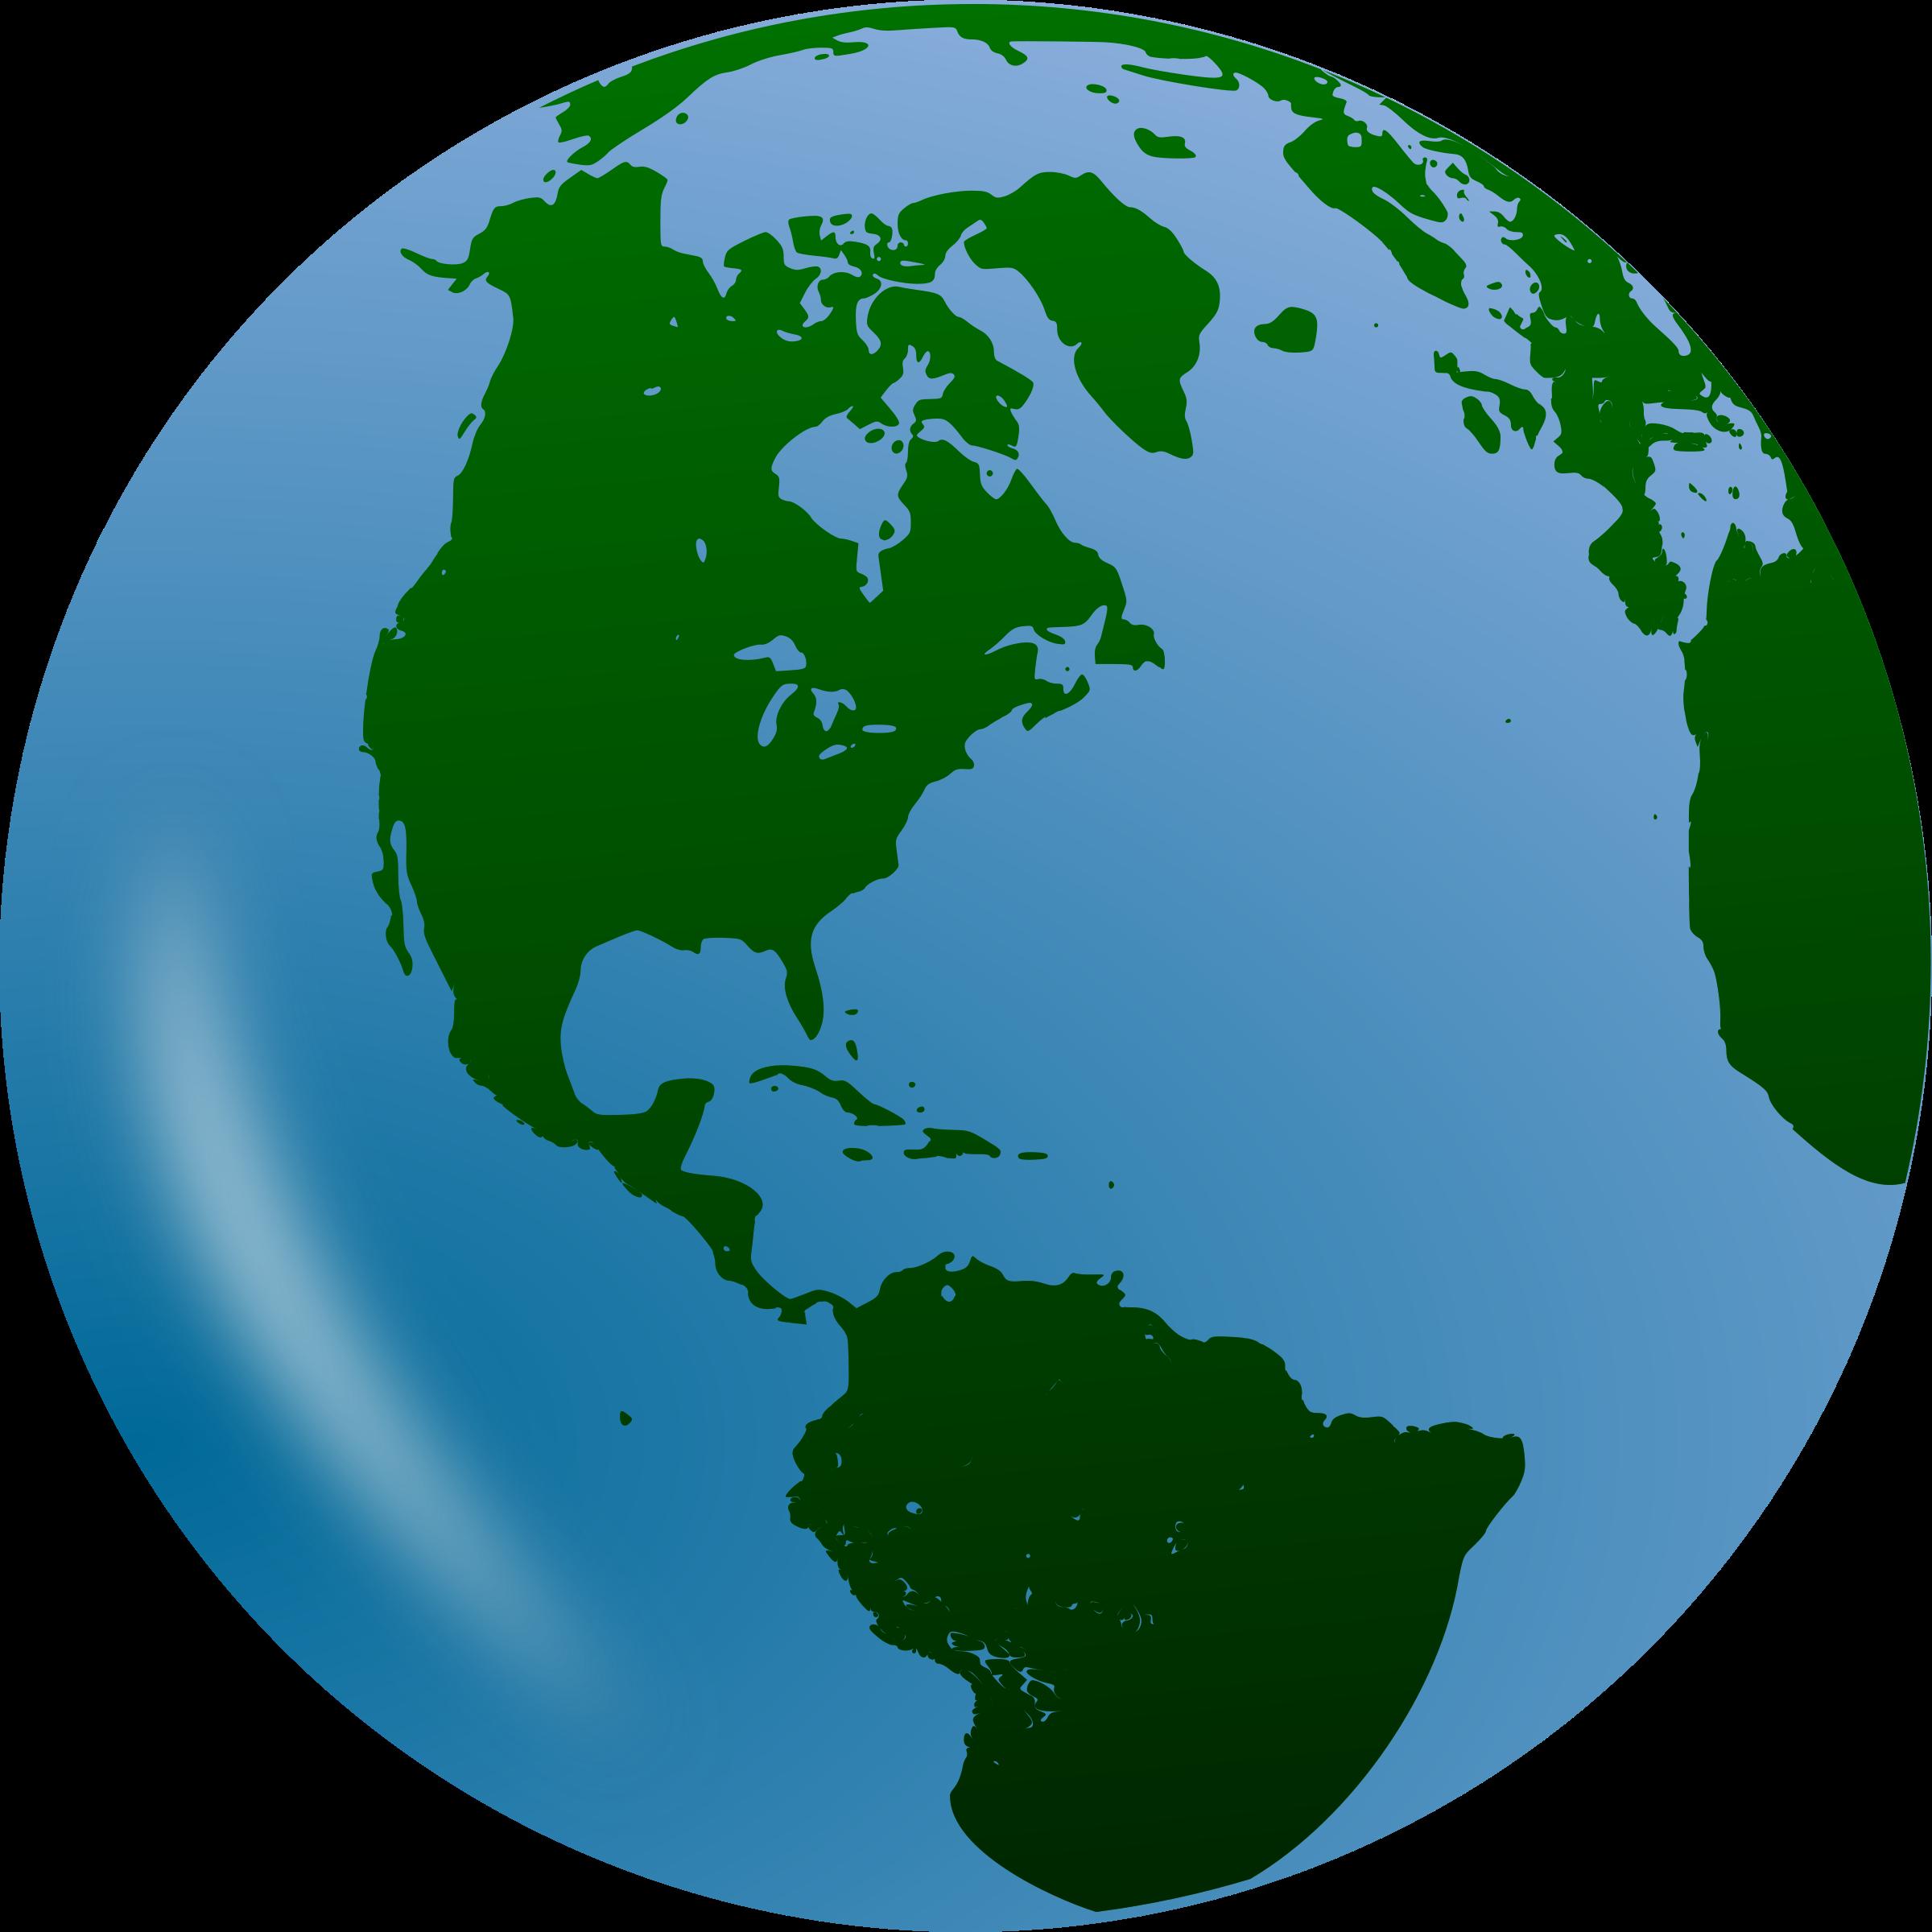 Globe by MajinCline